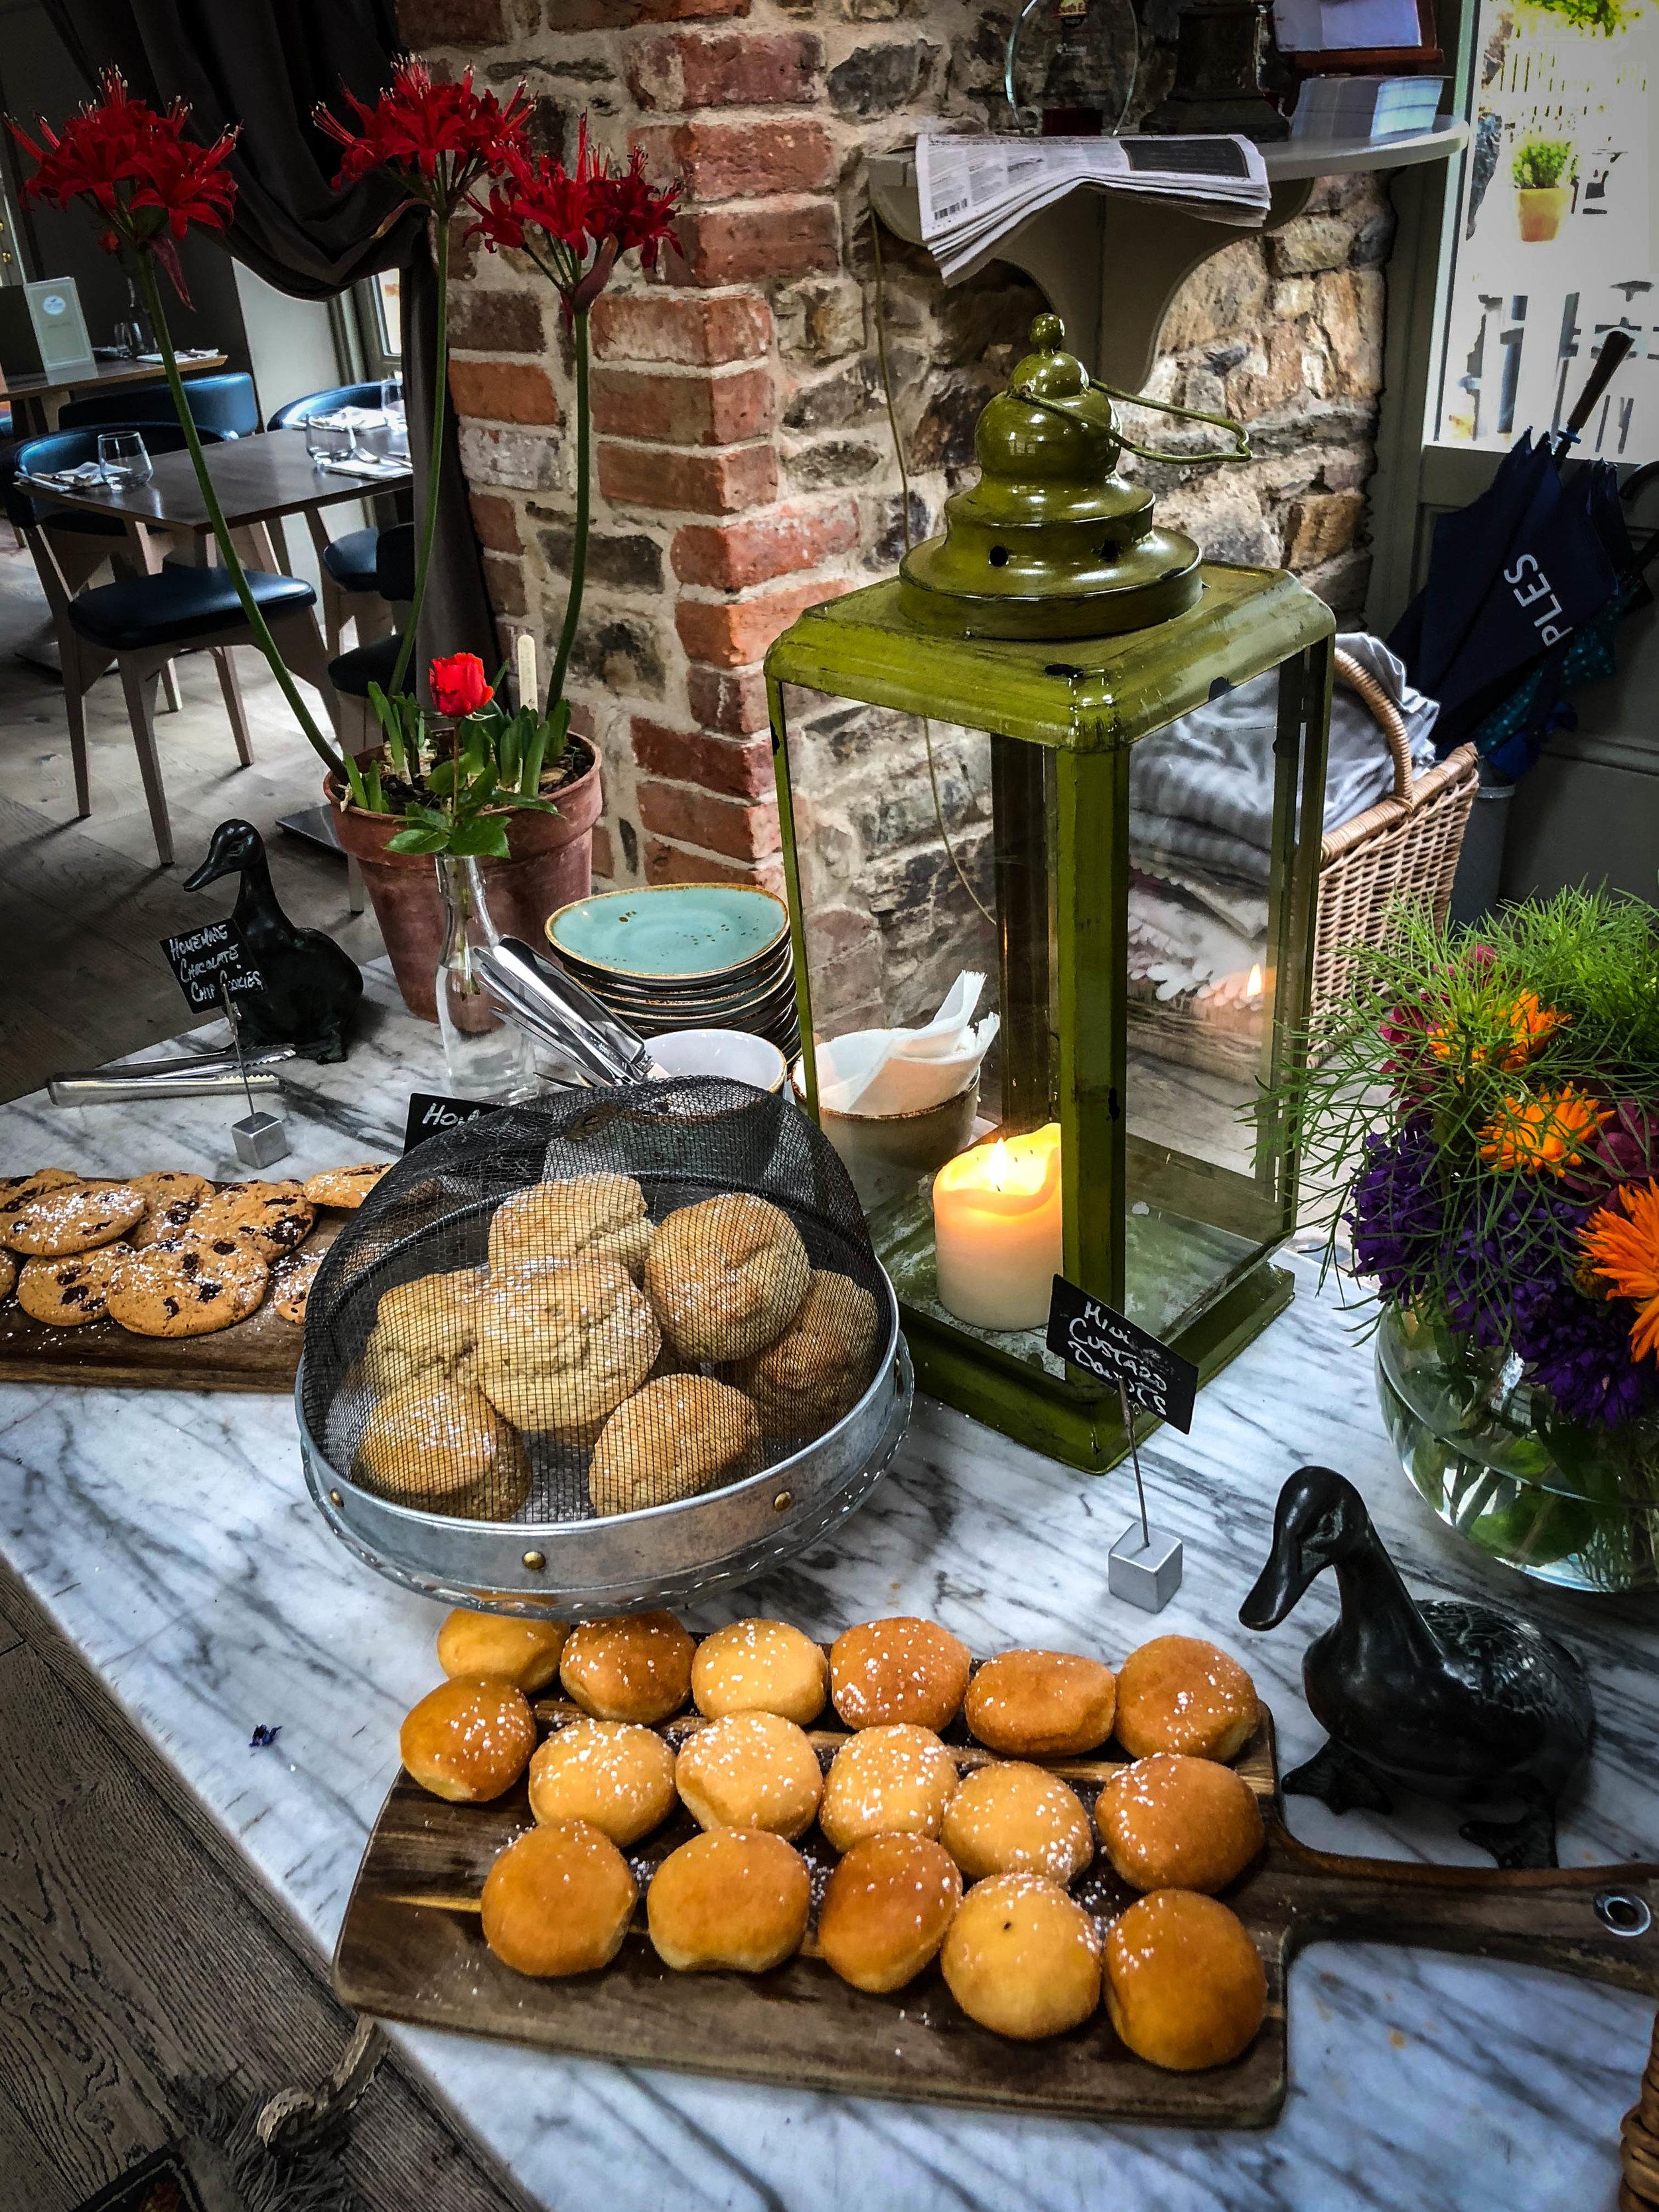 Marfield_House_Duck_Restaurant_Weston_Table.jpg